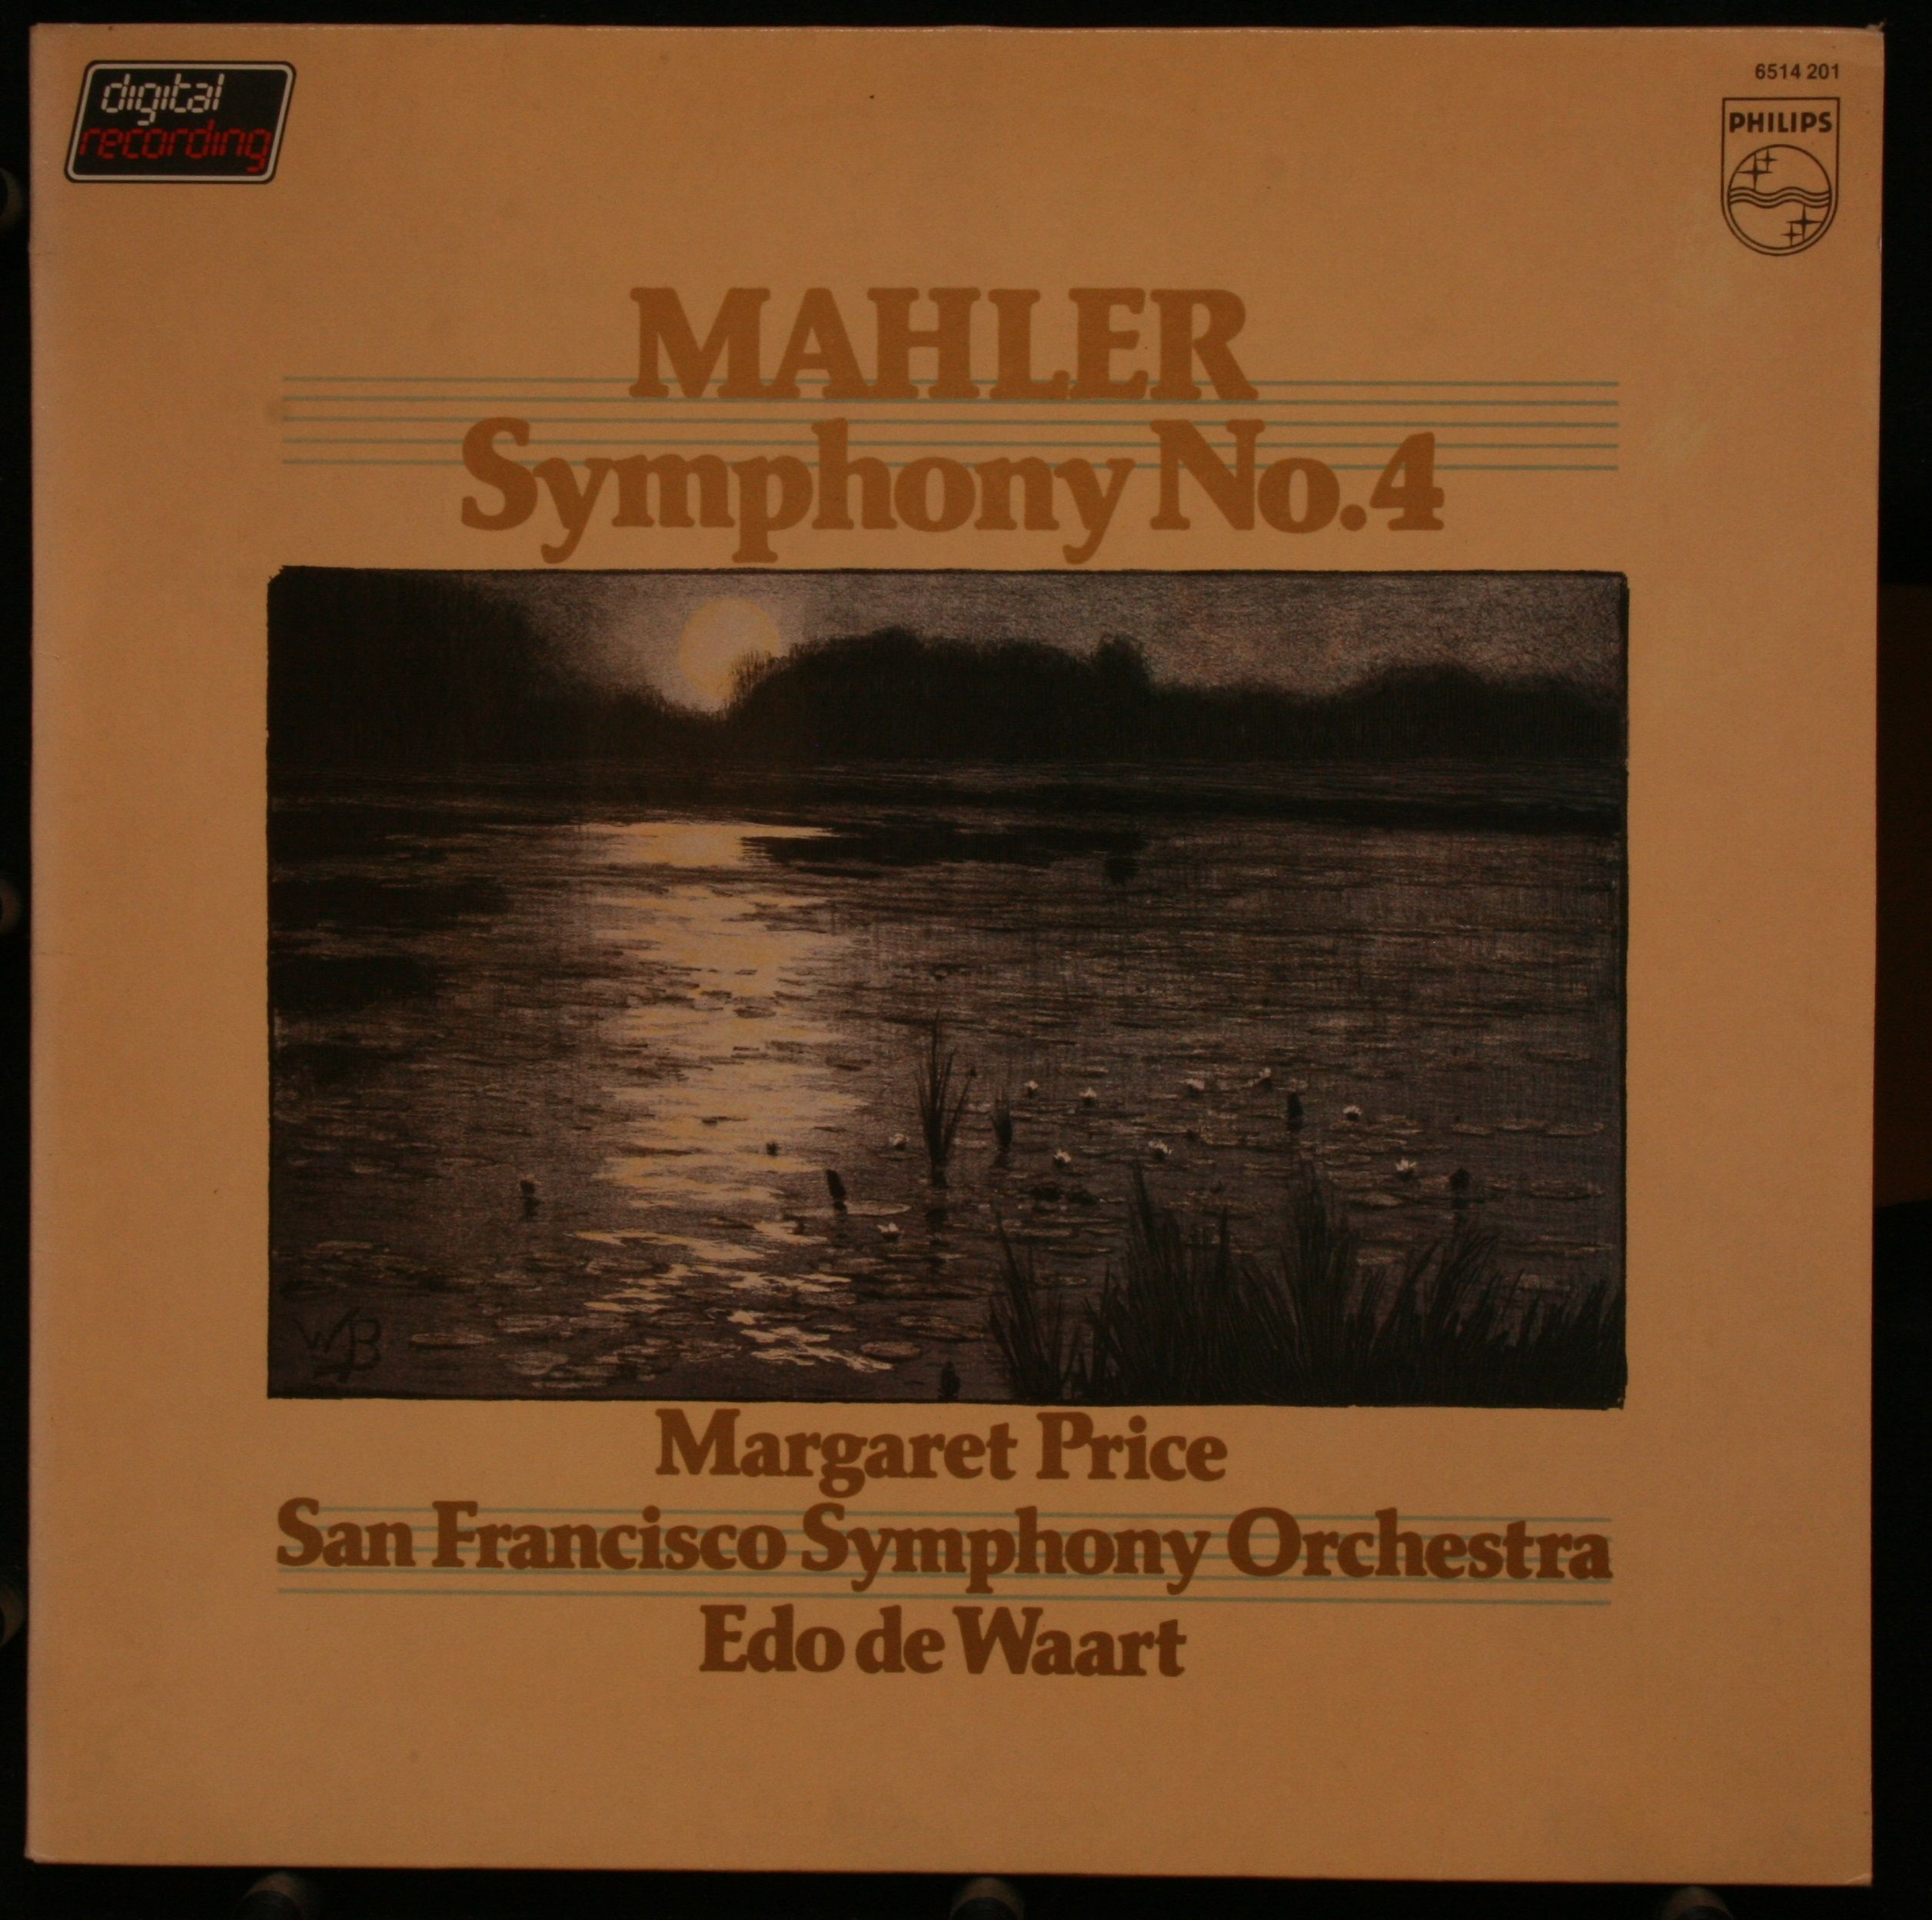 San Francisco Symphony Calendar.Price Margaret San Francisco Symphony Orchestra Symphony No 4